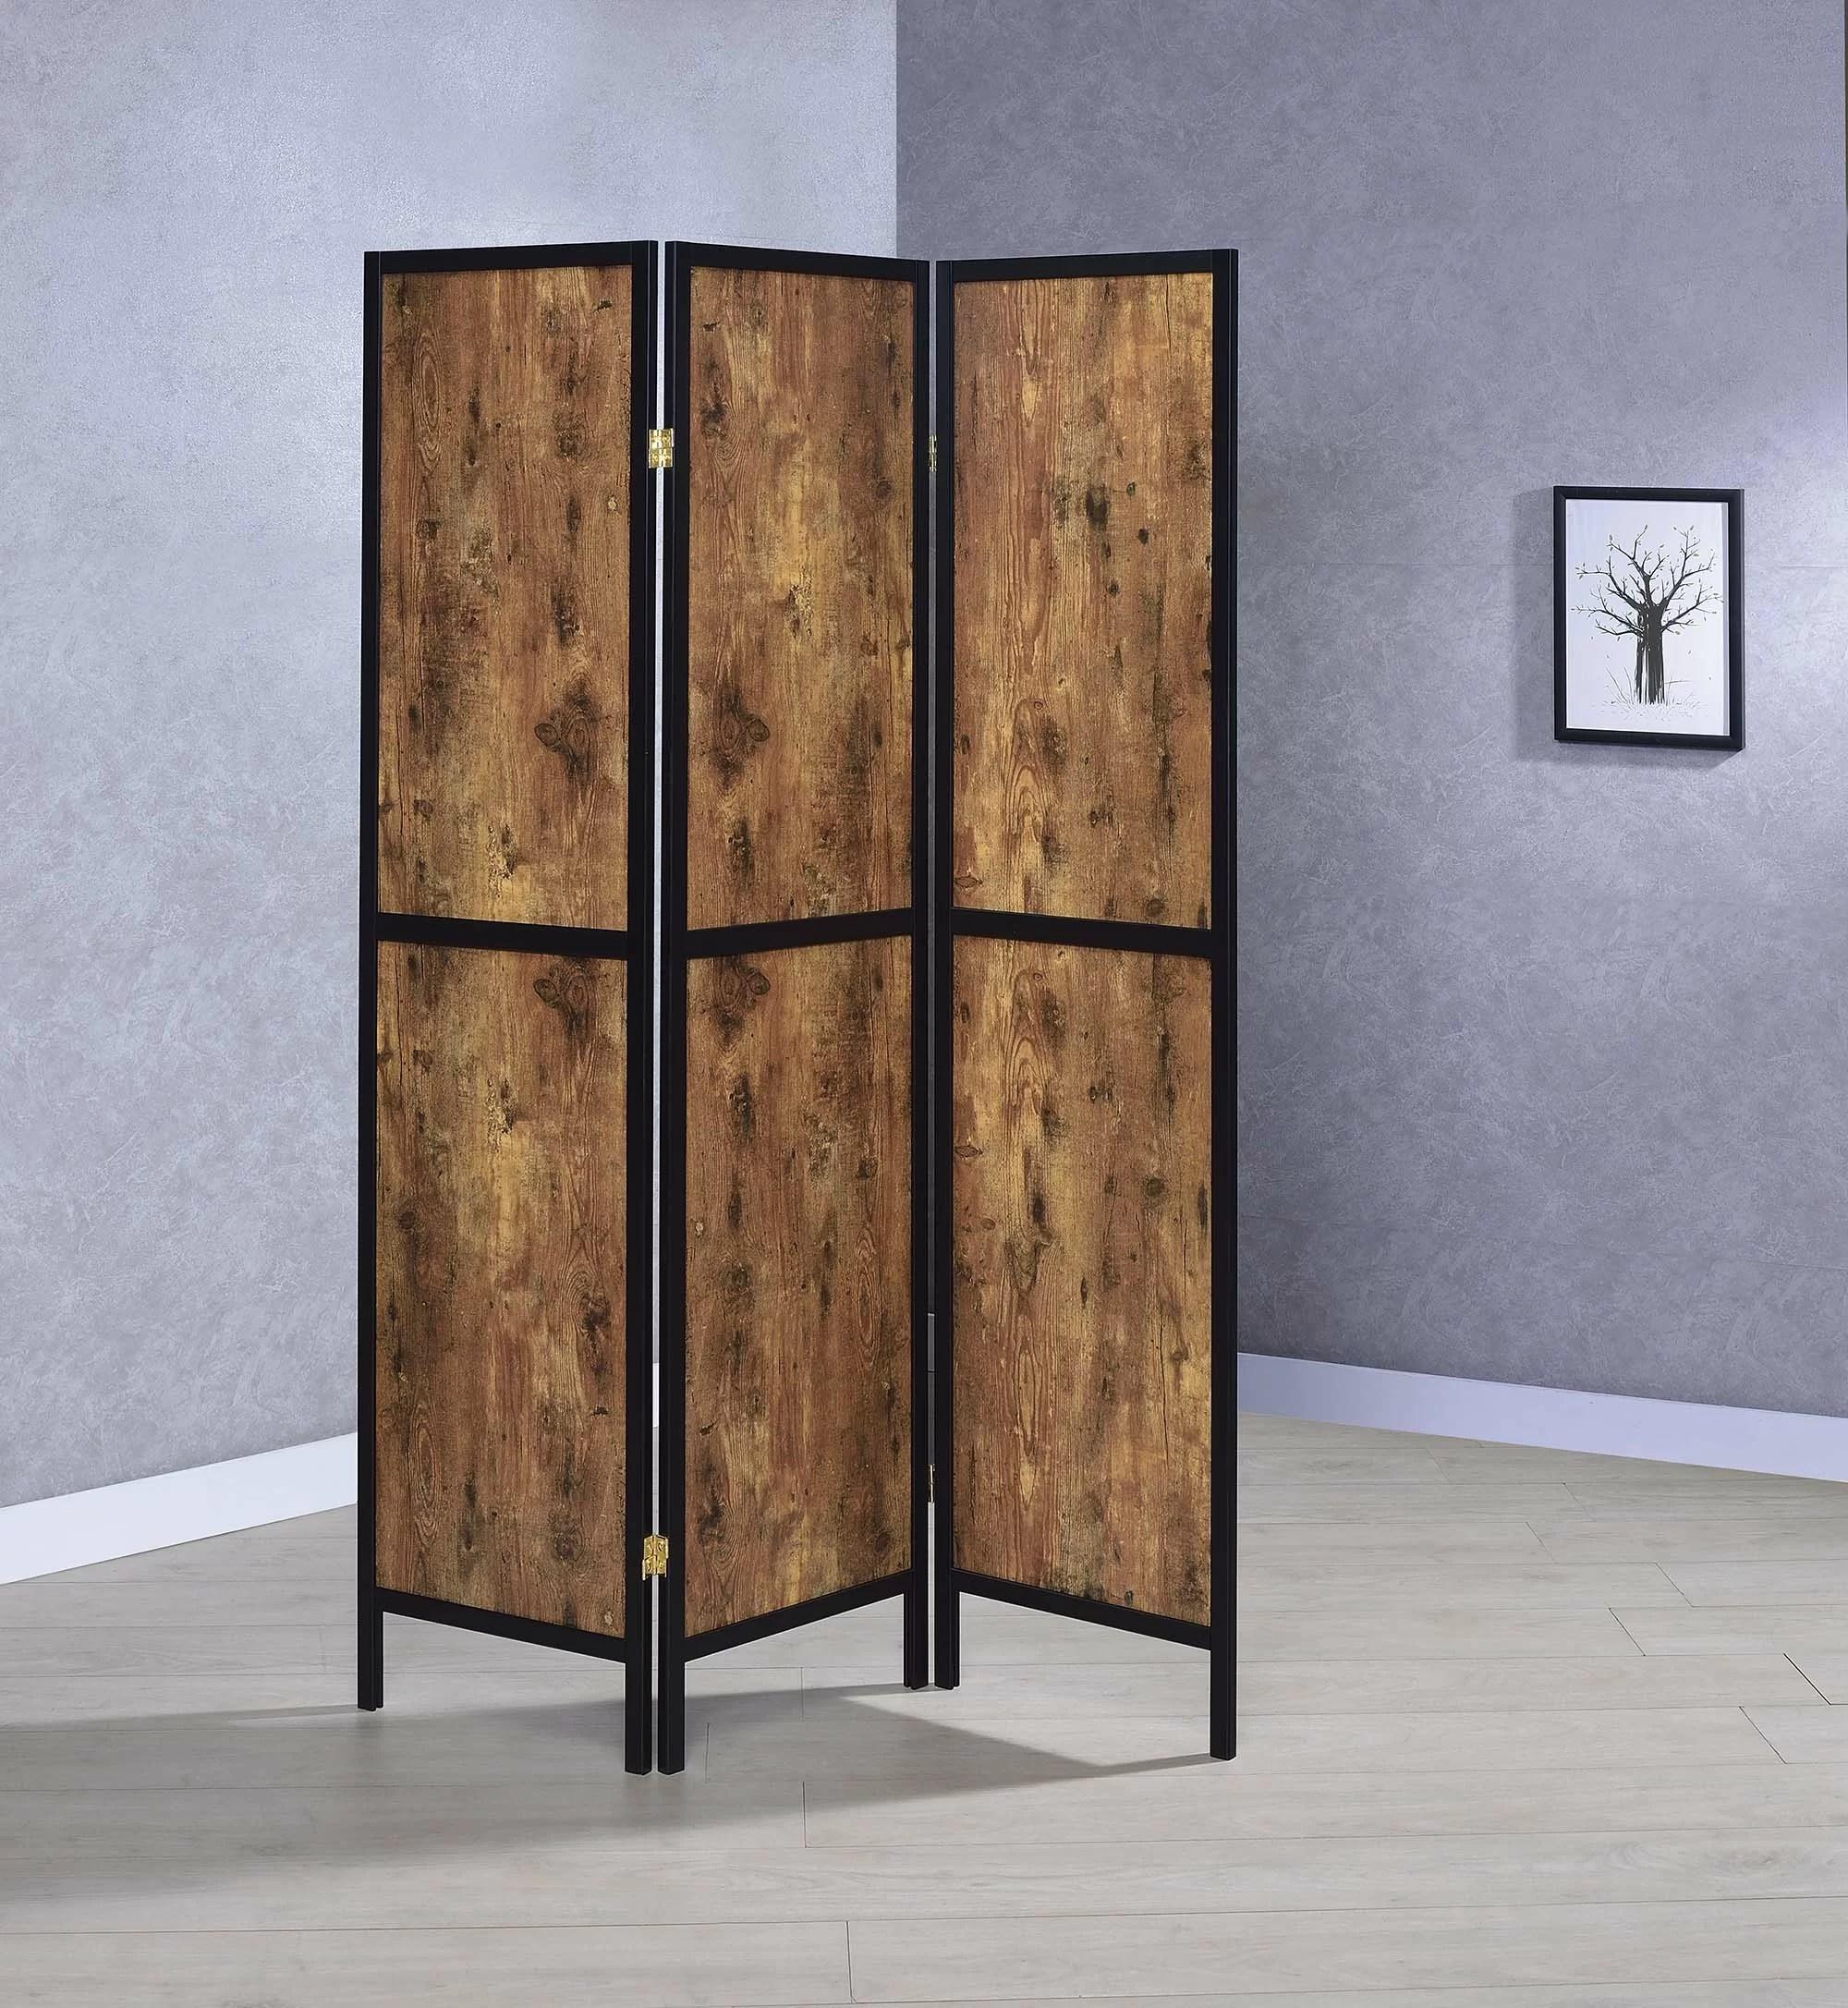 Williston Forge Carraway Folding Screen 3 Panel 70 25 Room Divider Reviews Wayfair